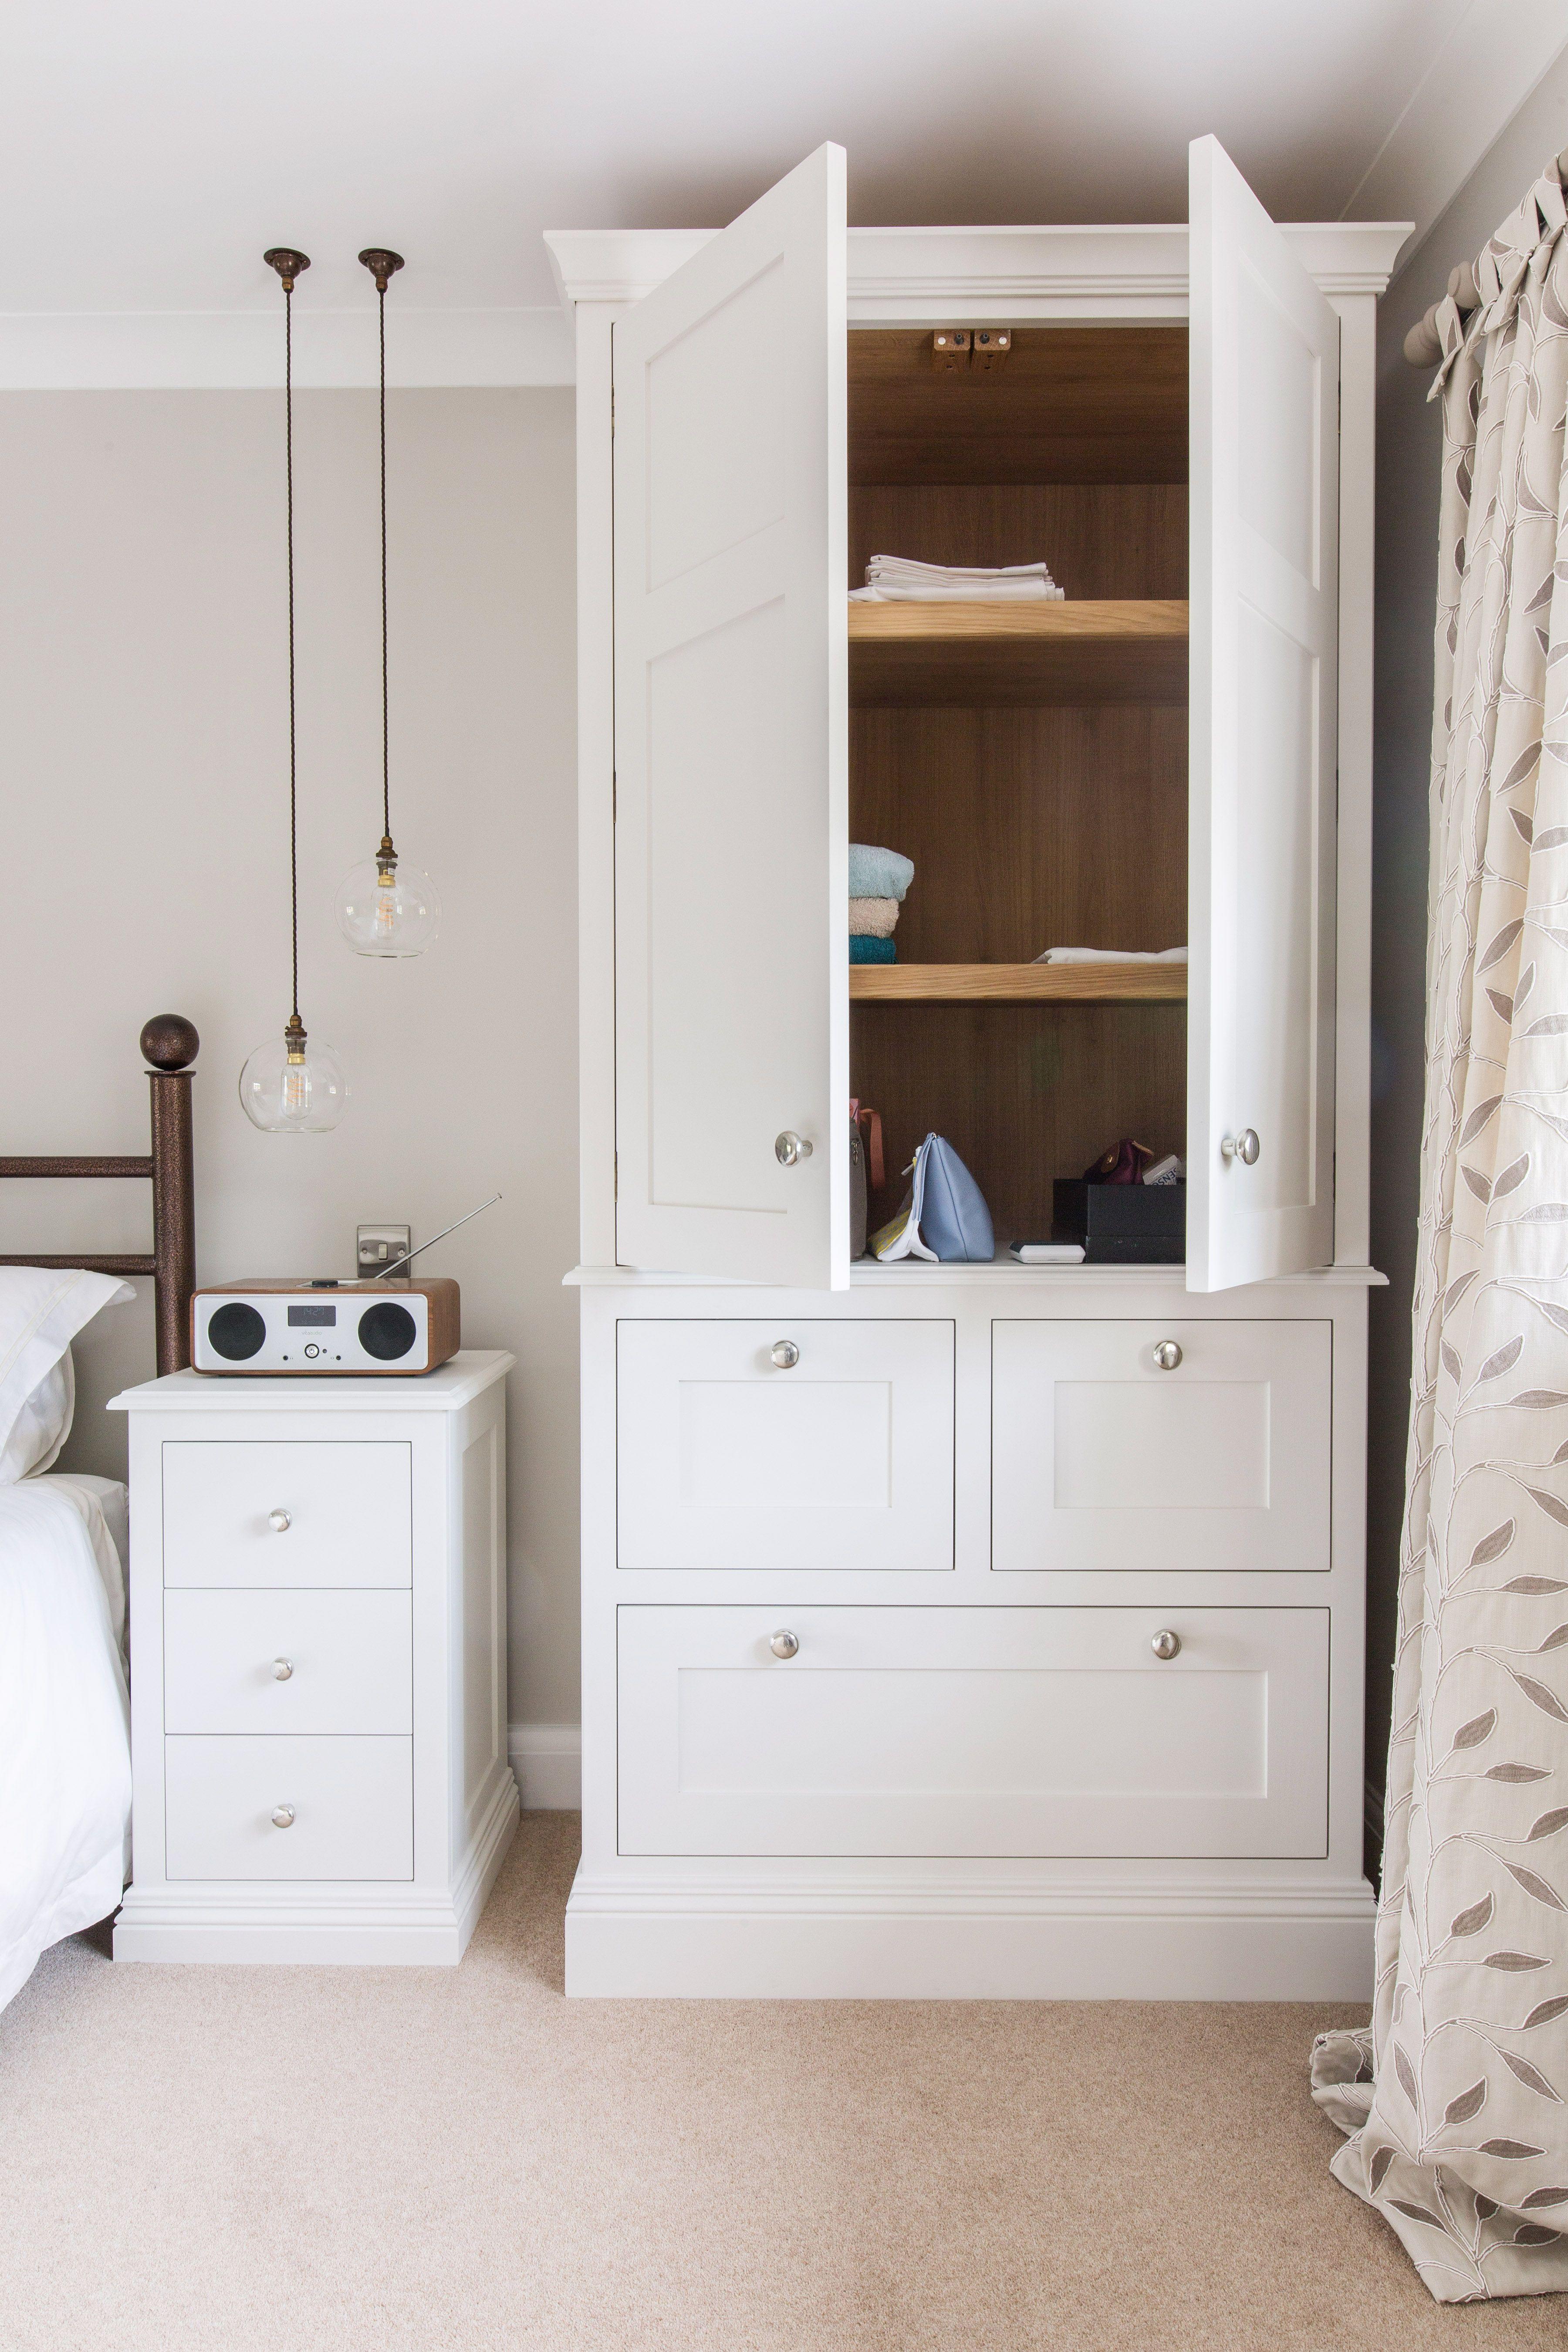 A peak inside a bespoke tall dresser unit, with oak shelves